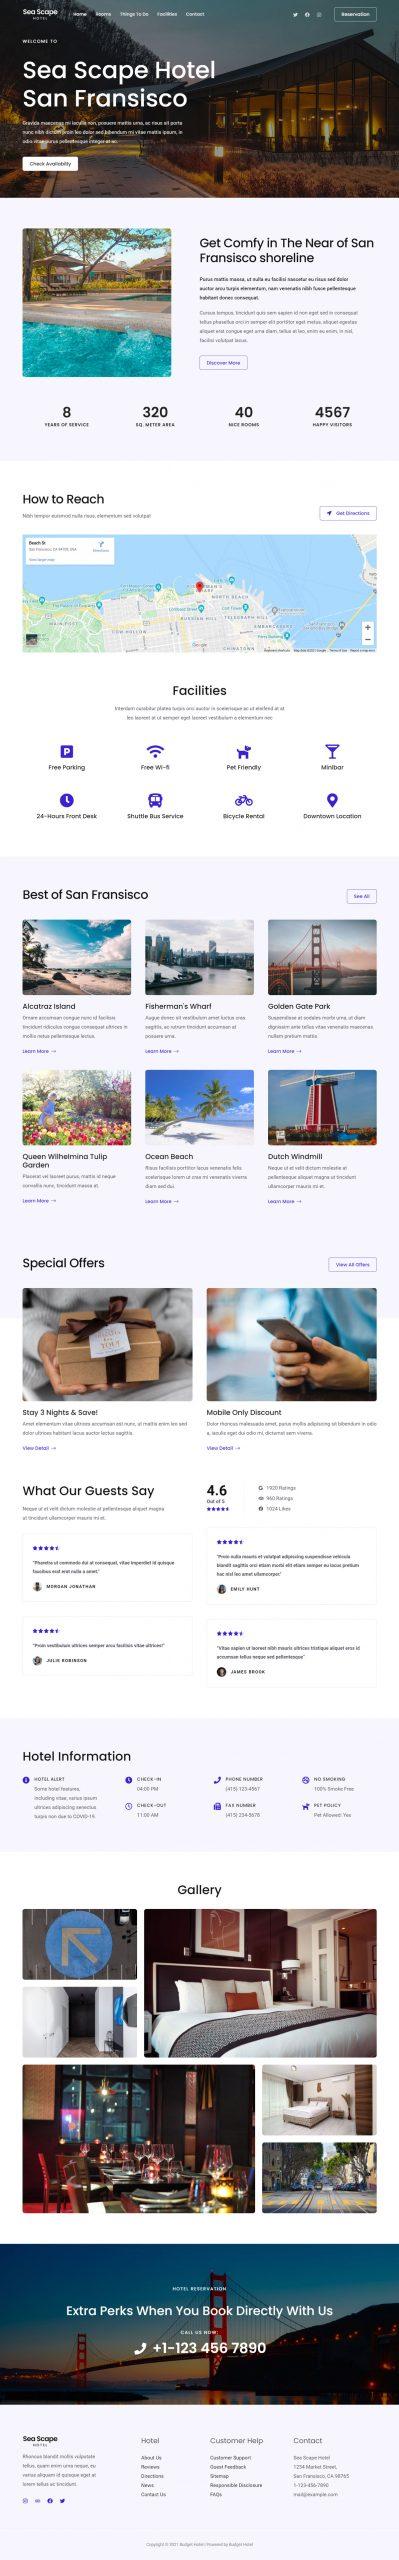 Adamo Web Design | Web Design Durham | budget hotel 04 home page scaled